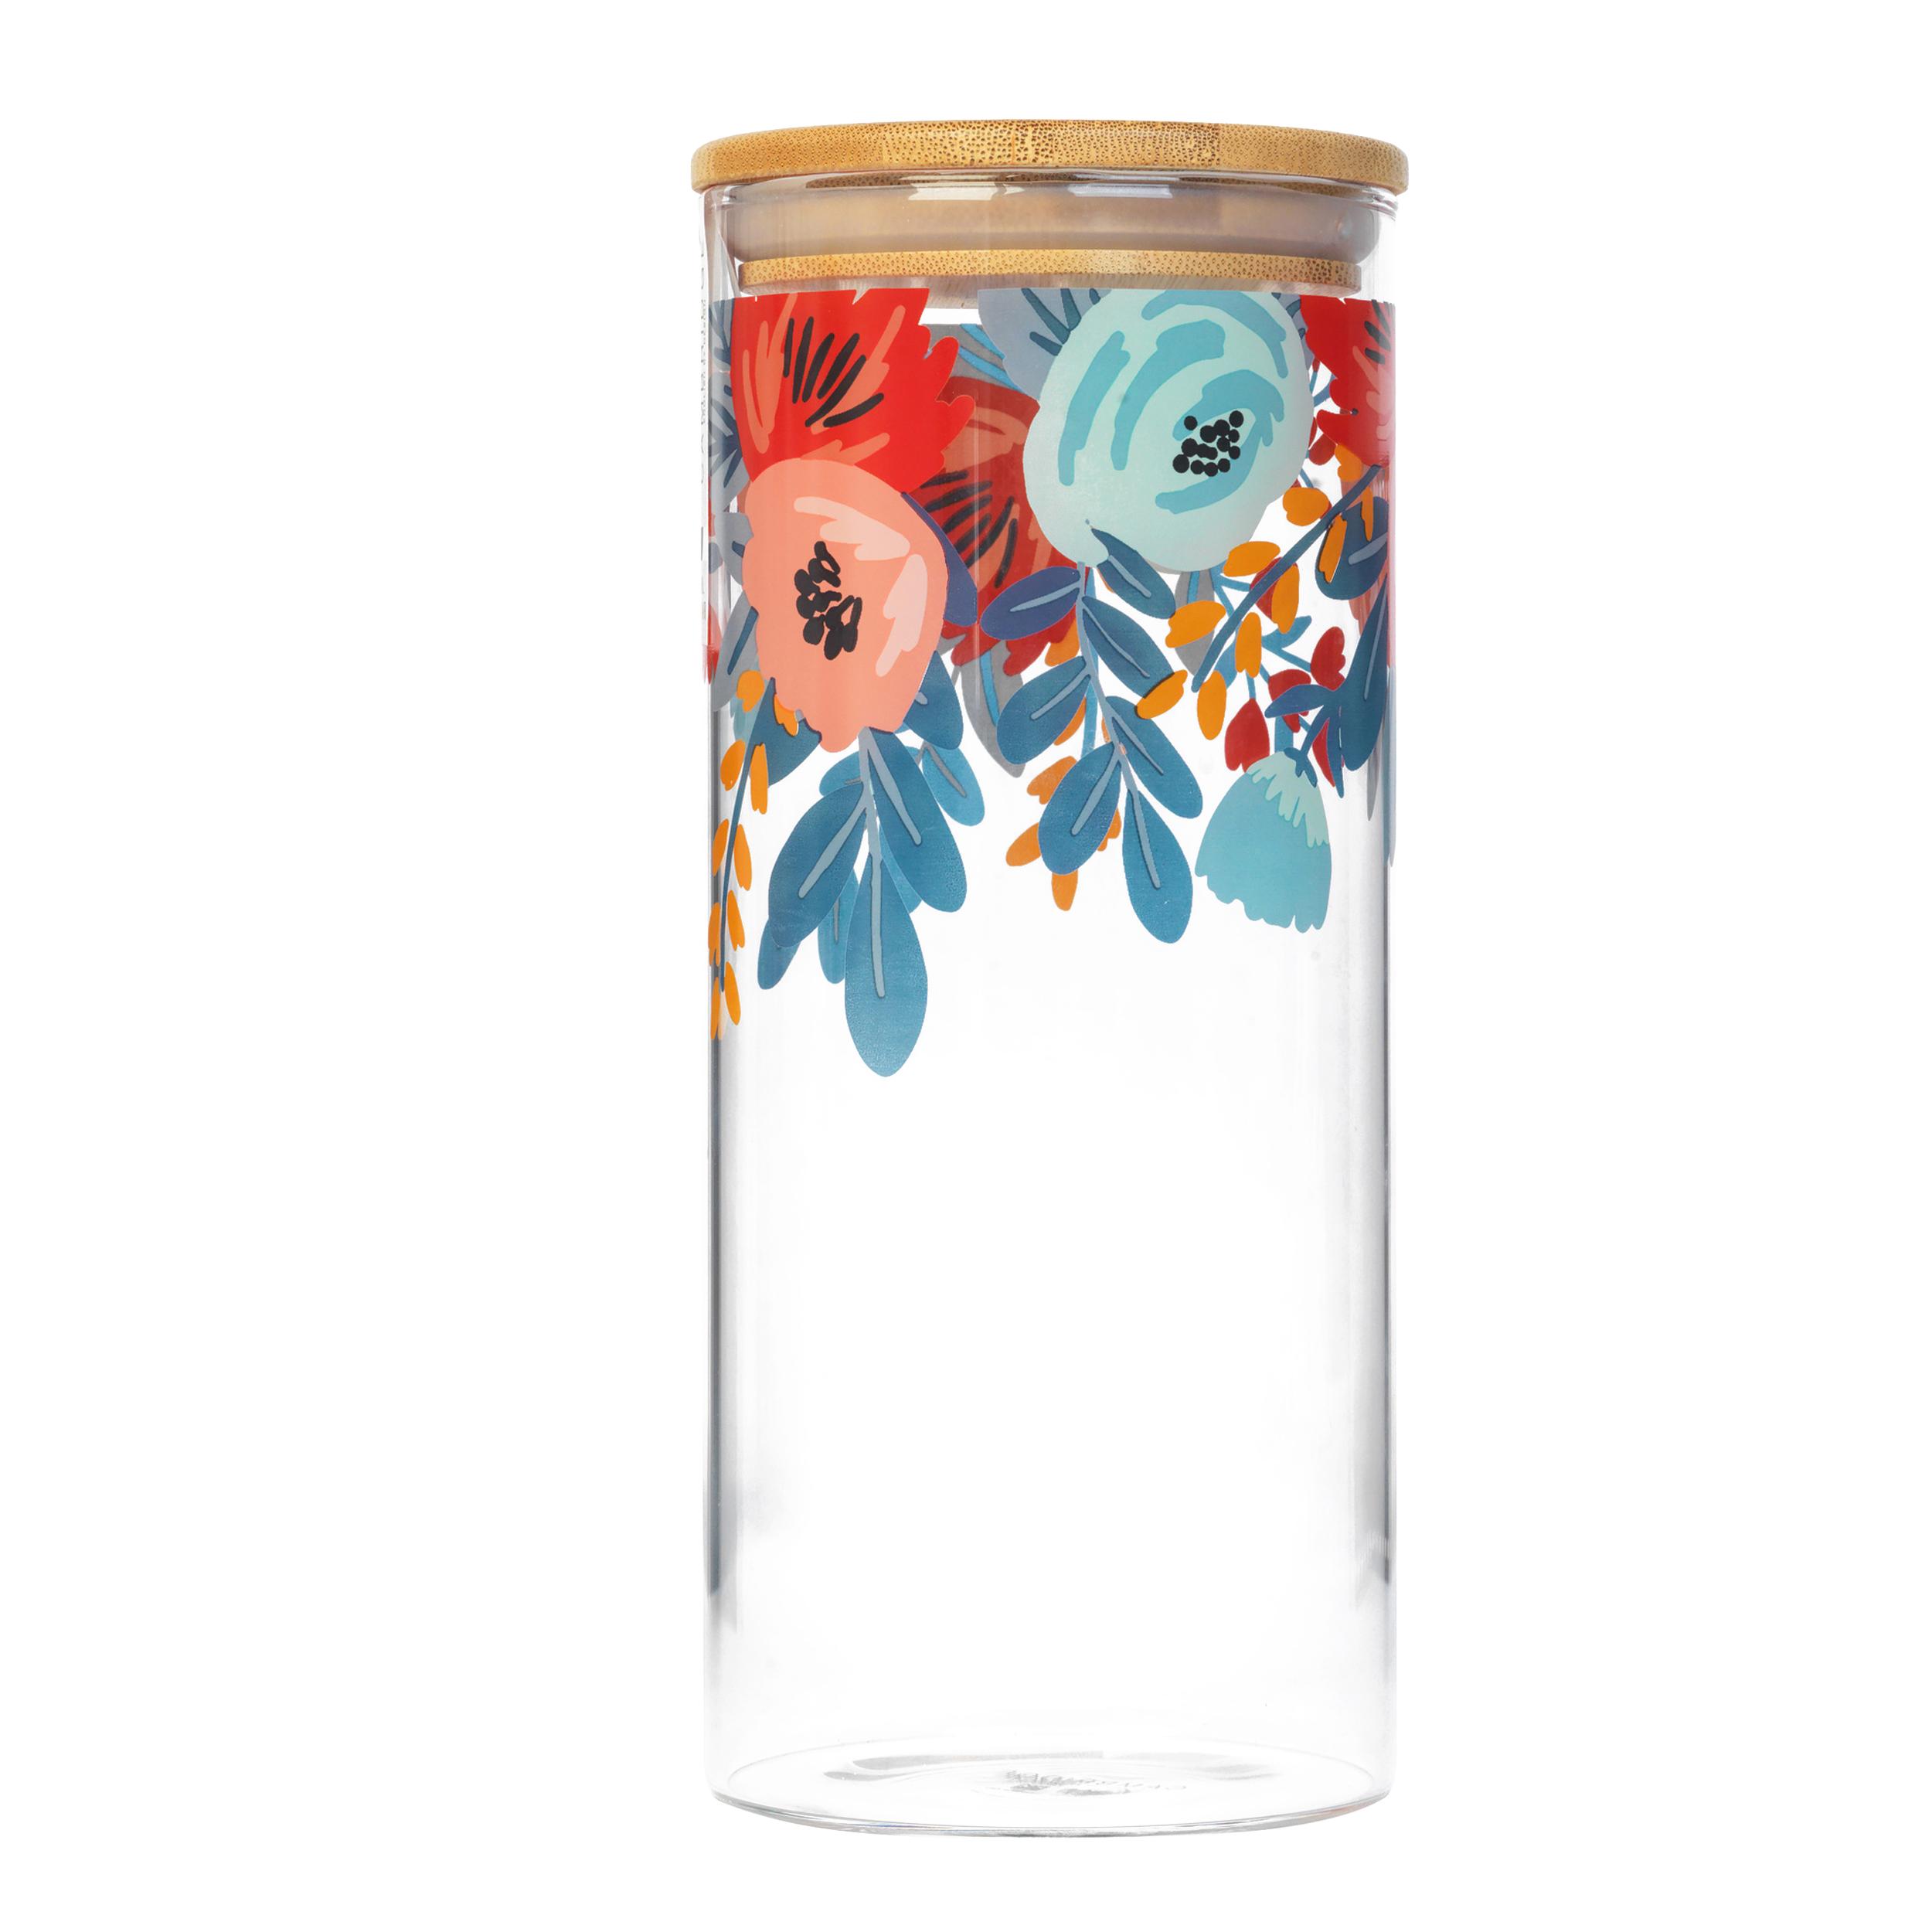 thumbnail 4 - Cambridge® Storage Preserving Glass Jar, 1200 ml, Spring Meadow/Doodle/Arielle